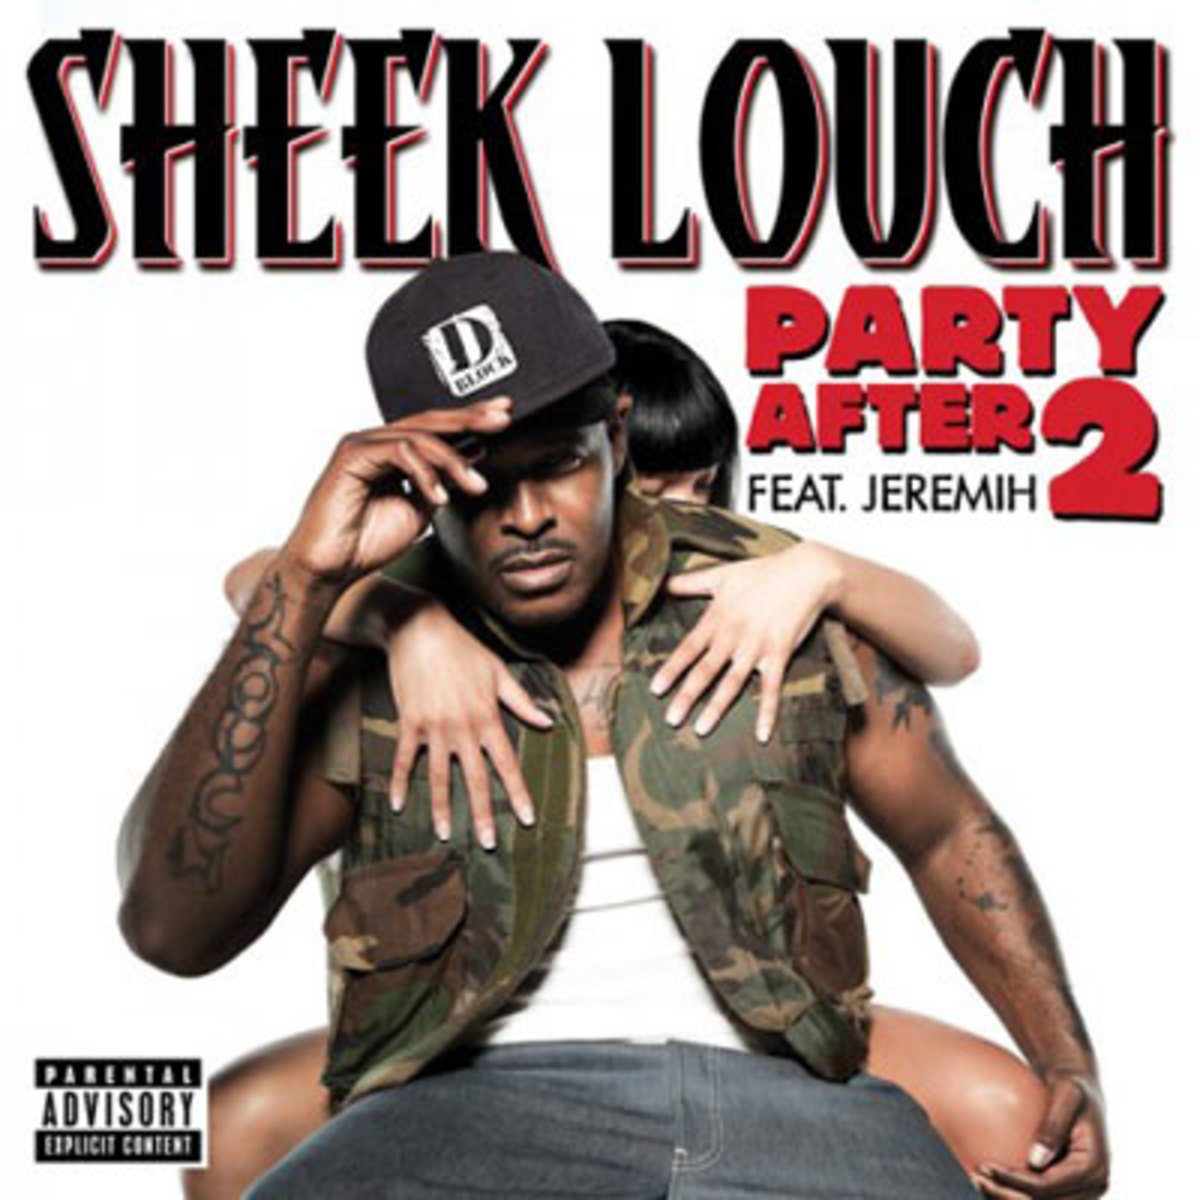 sheeklouch-partyafter2.jpg